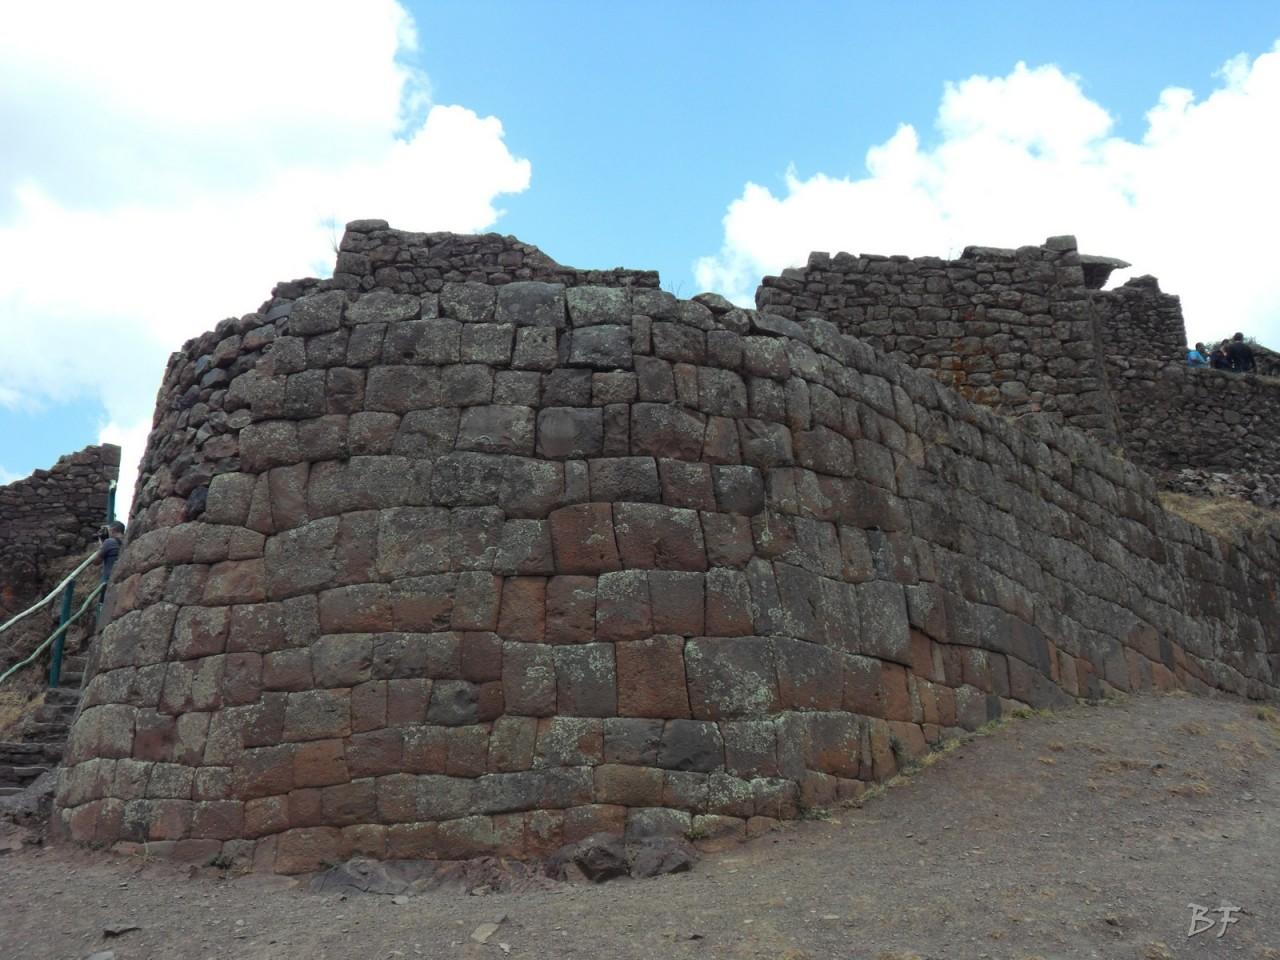 Mura-Poligonali-Megaliti-Altari-Rupestri-Pisac-Cusco-Perù-16